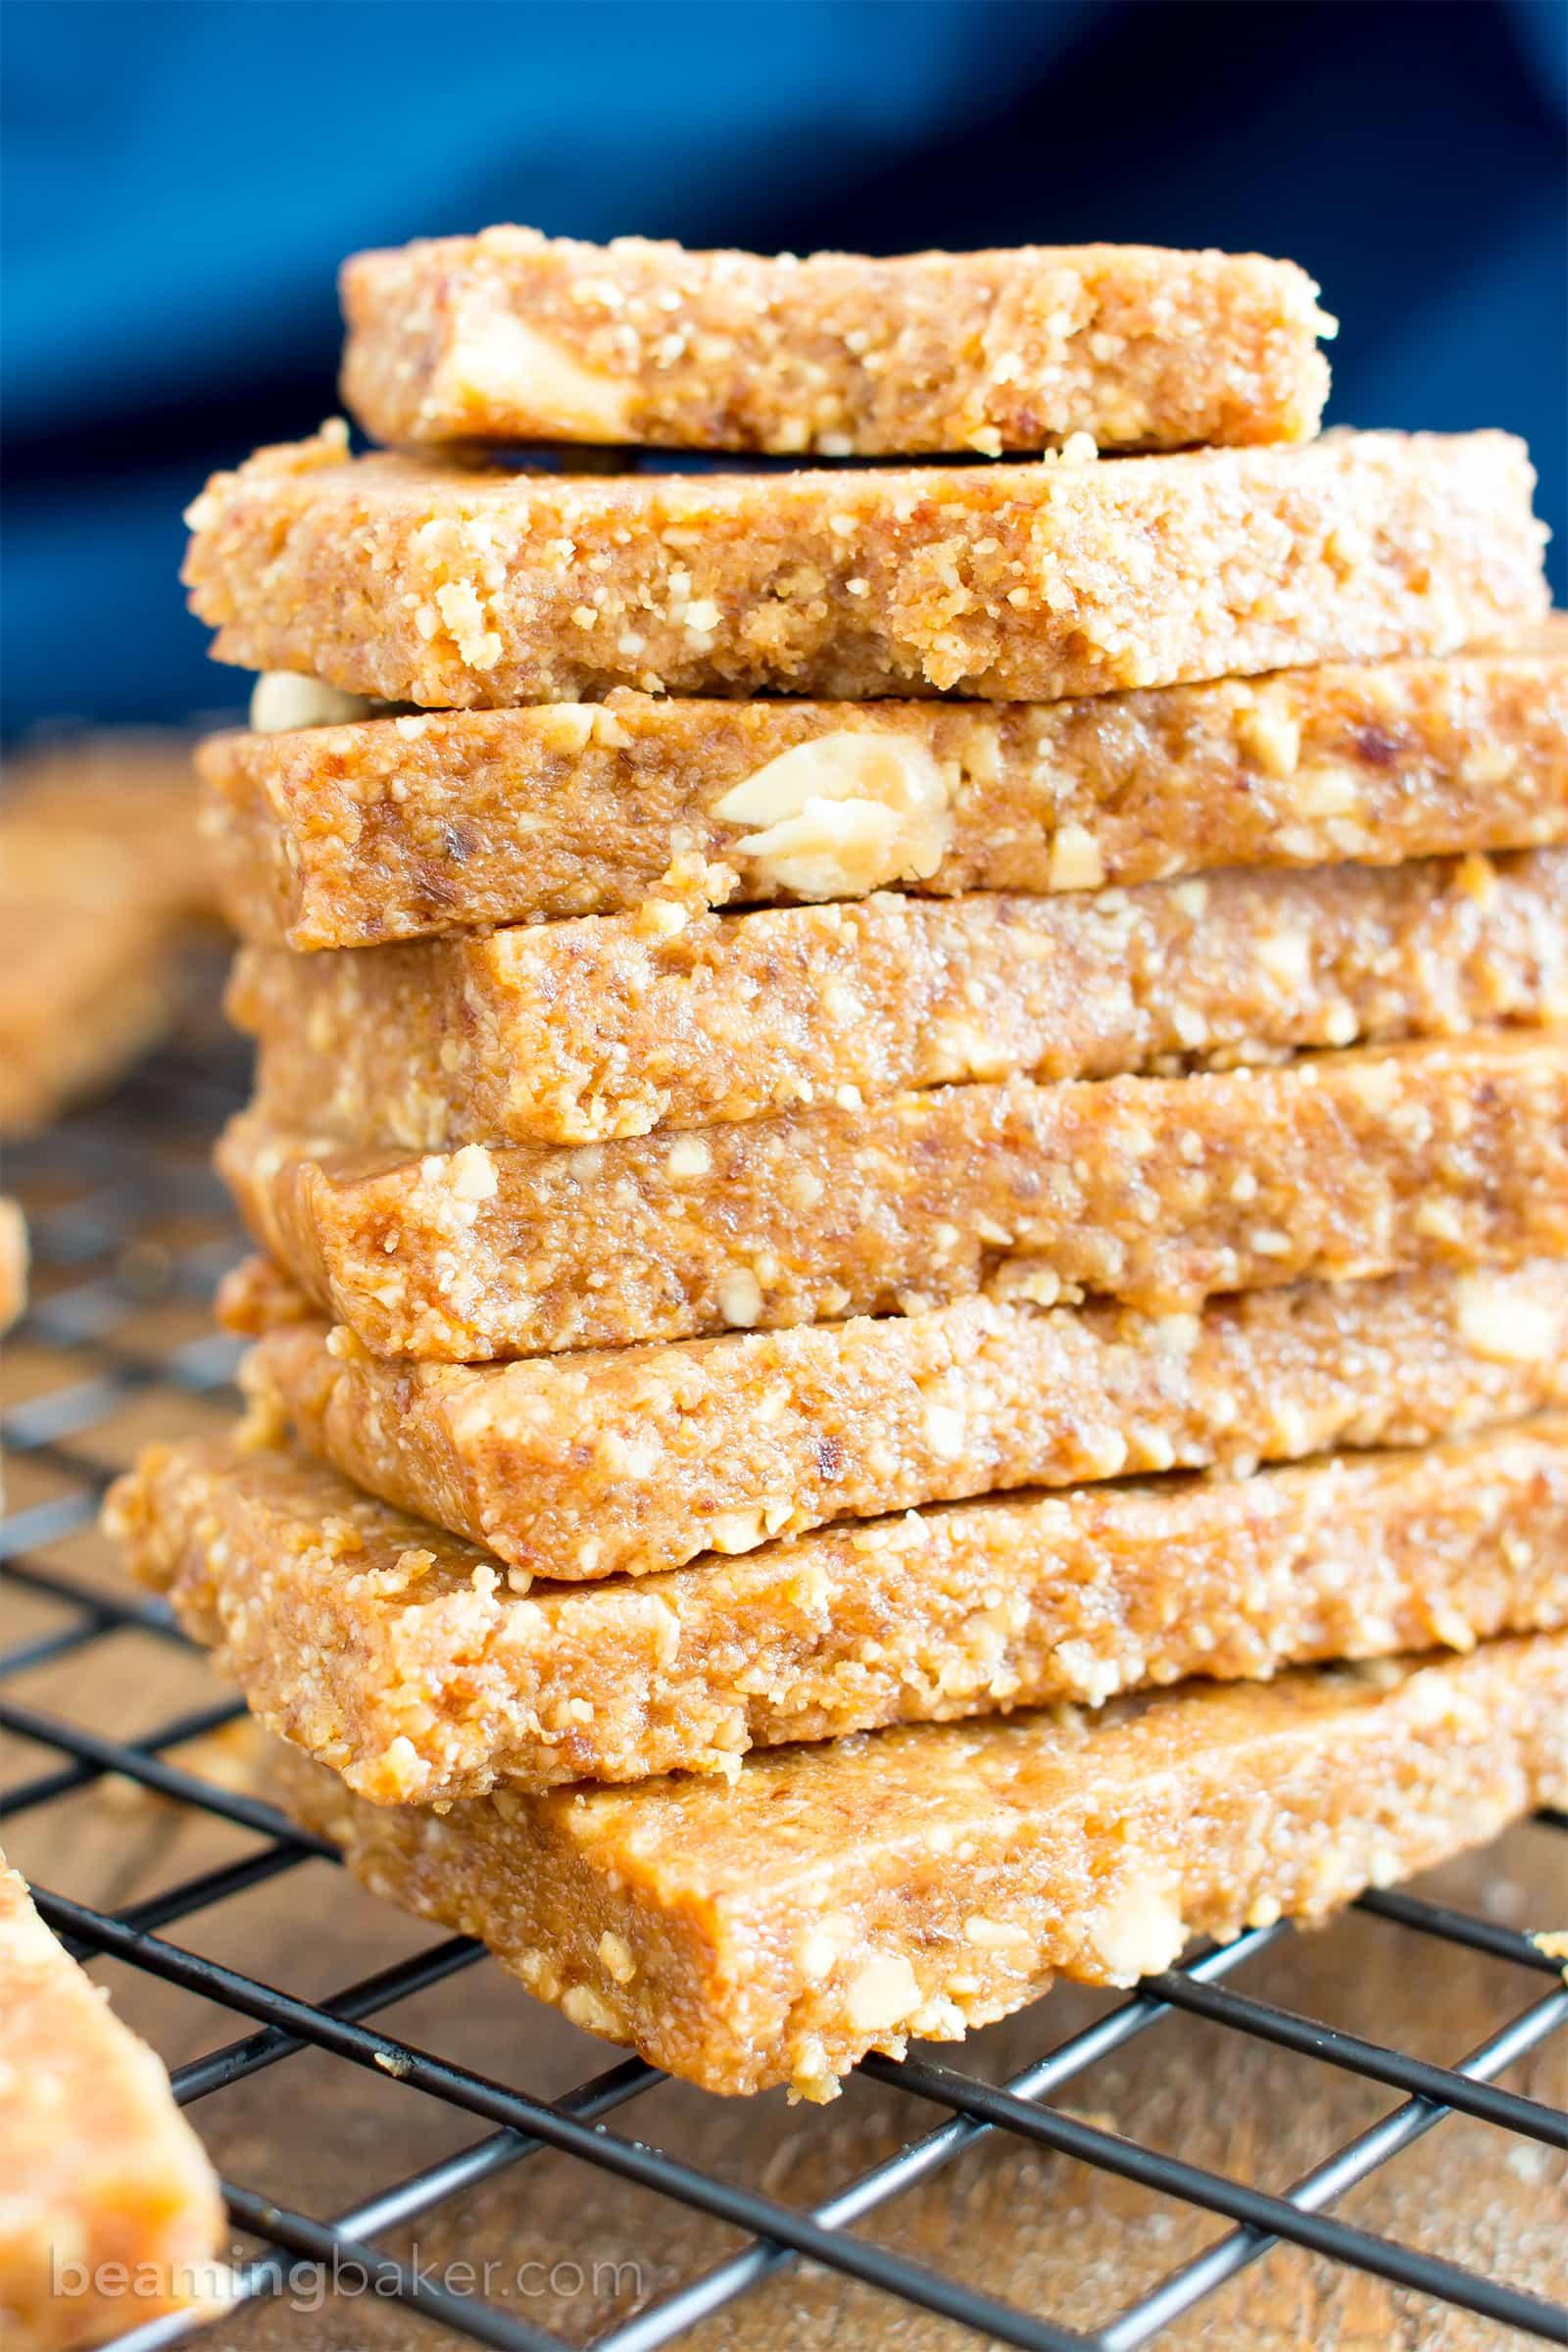 4 Ingredient No Bake Peanut Butter Cookie Energy Bars (V, GF, DF): an easy recipe for simple salty 'n sweet energy bars that taste like peanut butter cookies! #Vegan #GlutenFree #ProteinPacked #DairyFree | BeamingBaker.com